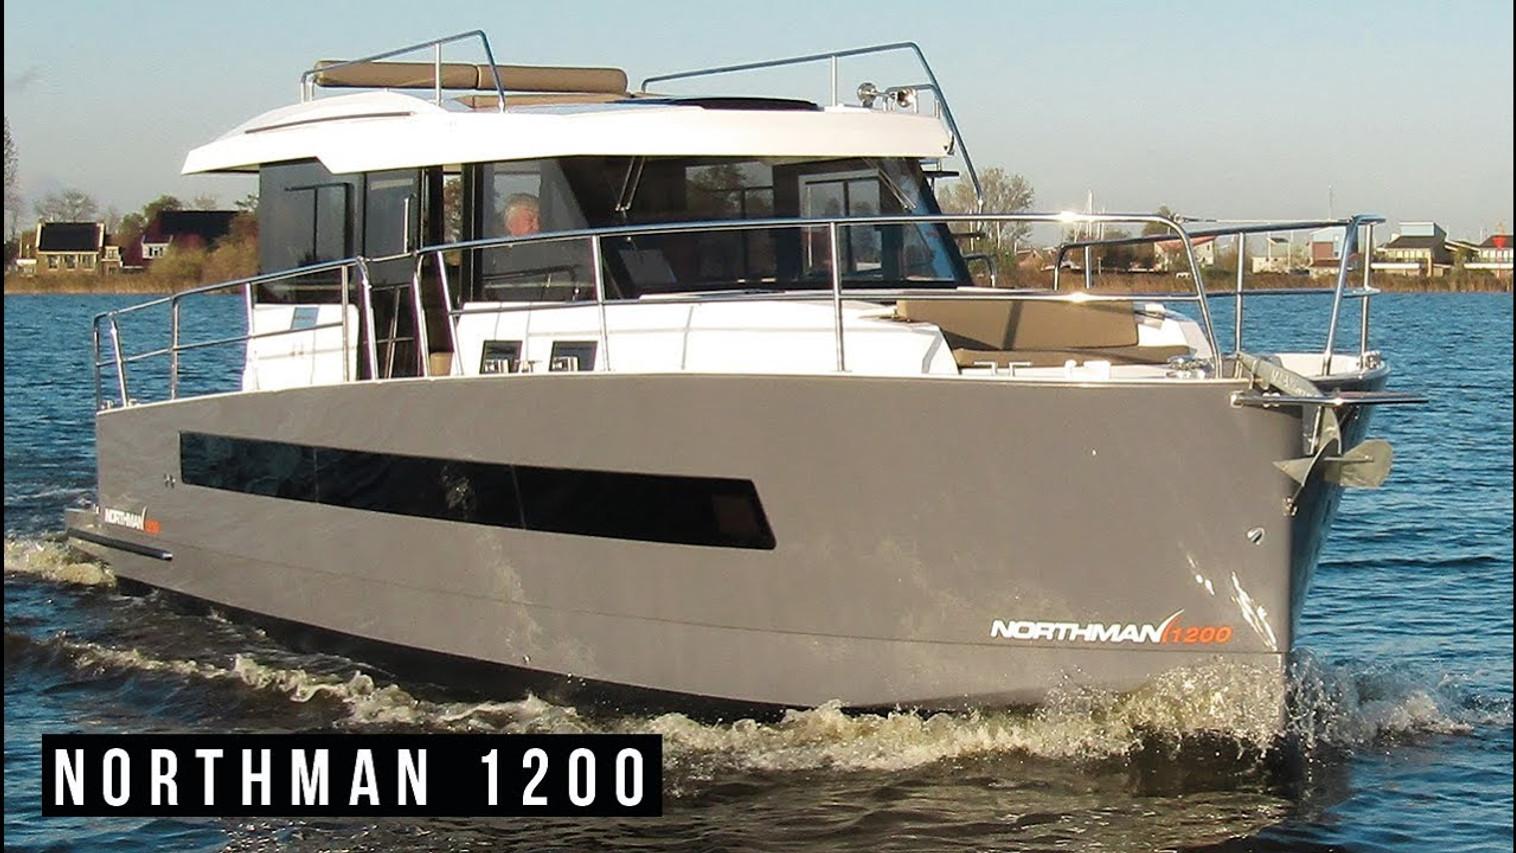 Northman 1200 Walkaroud: exterior and interior mood video